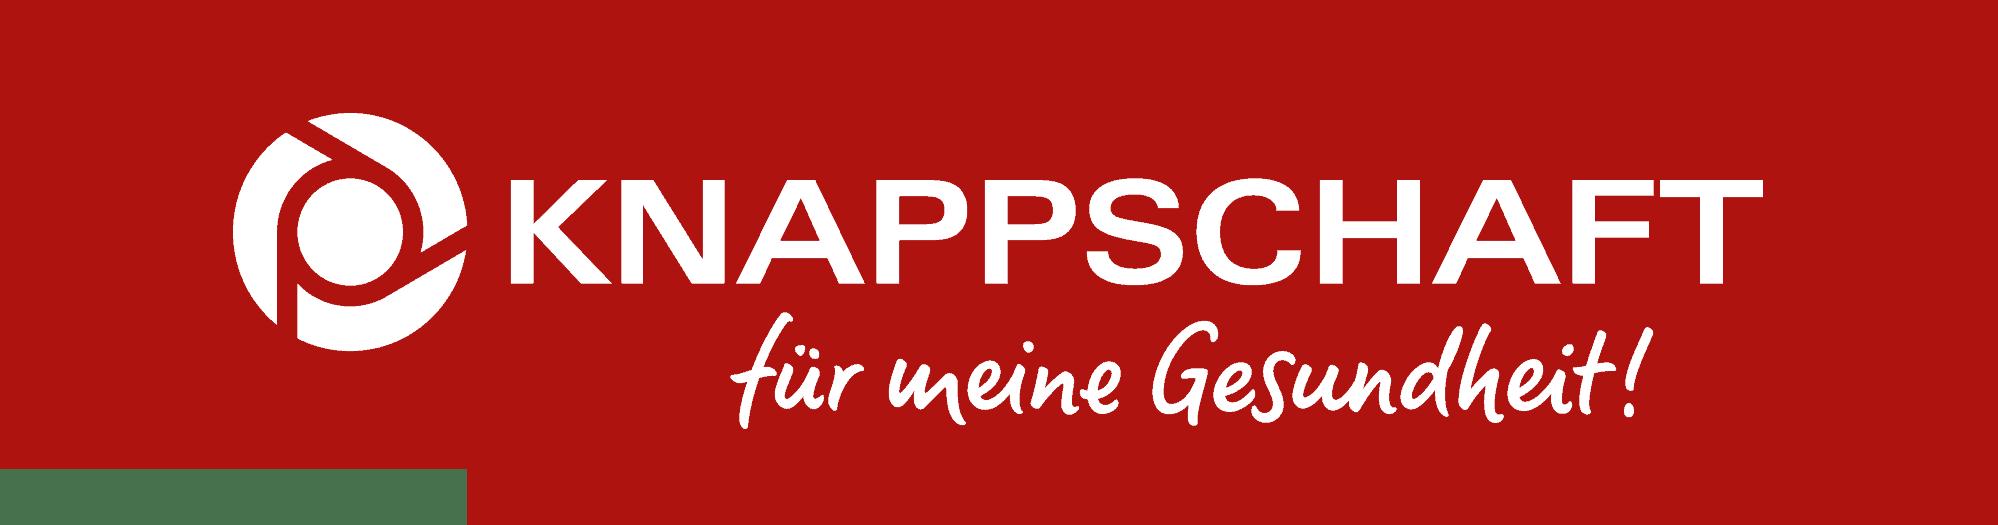 KNAPPSCHAFT Blog